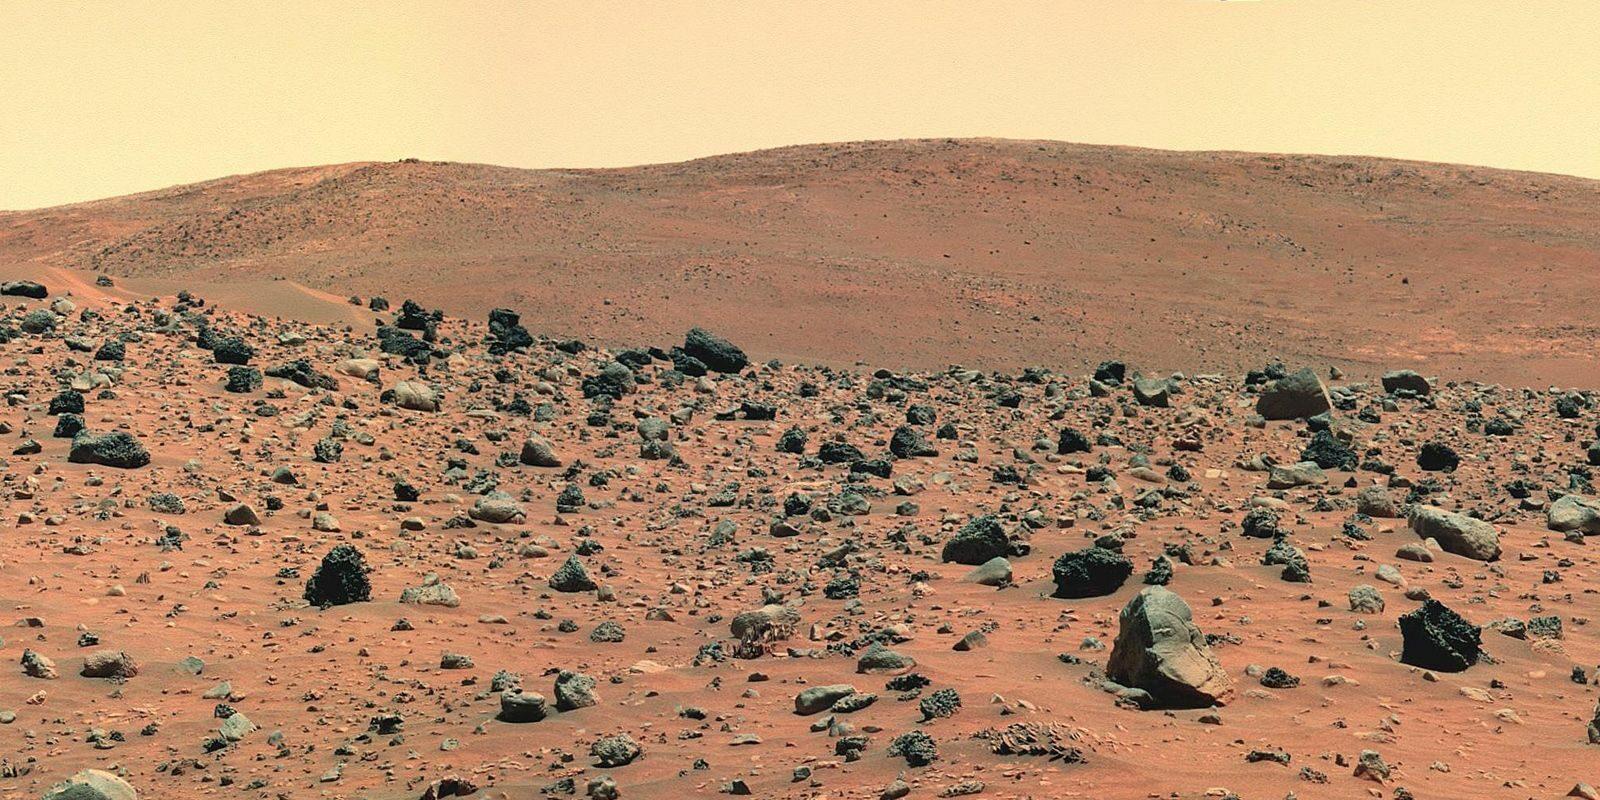 Le voyage extraordinaire sur Mars !